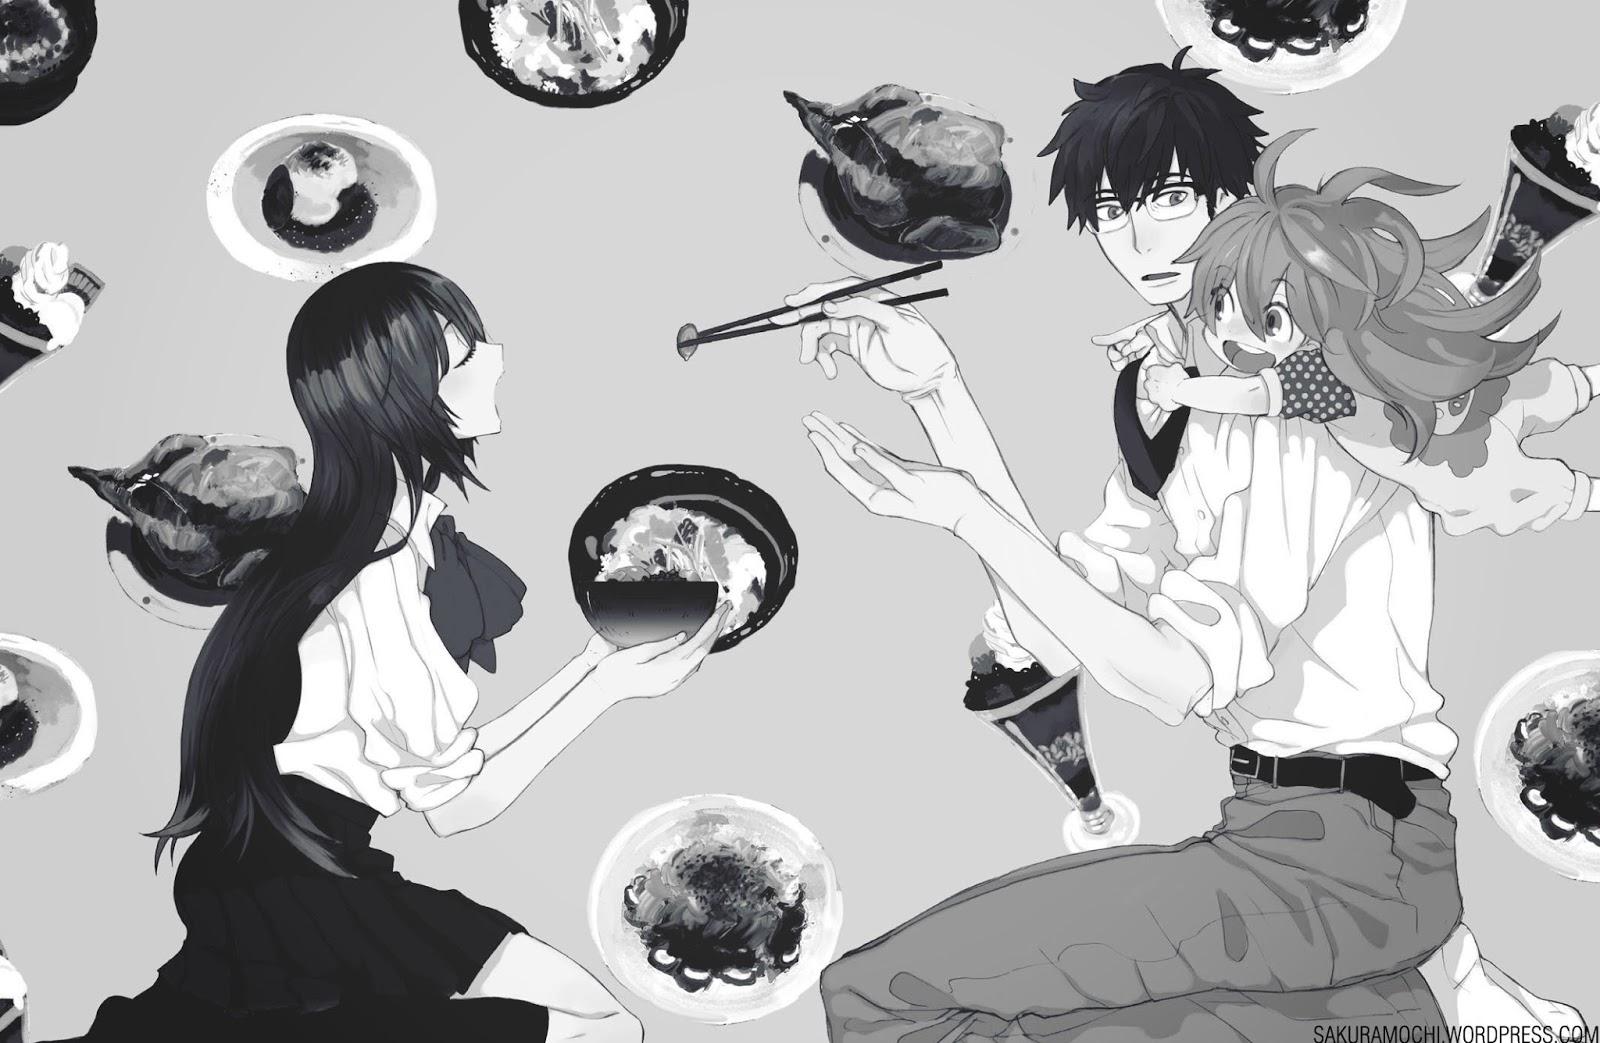 Xem Phim Amaama To Inazuma - Sweetness And Lightning - Wallpaper Full HD - Hình nền lớn